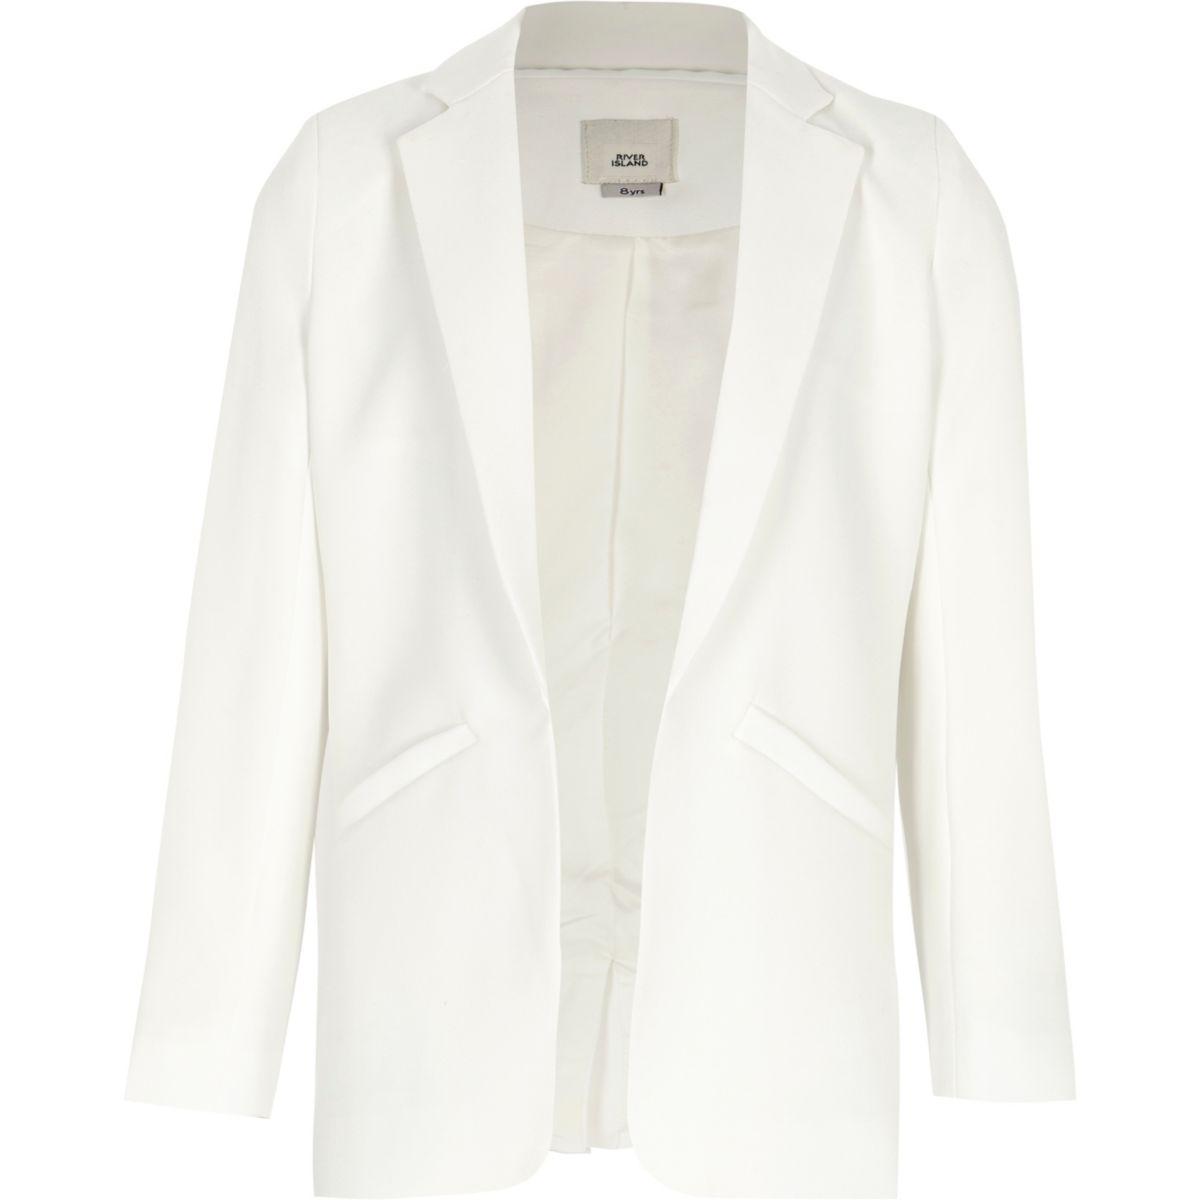 Girls white blazer